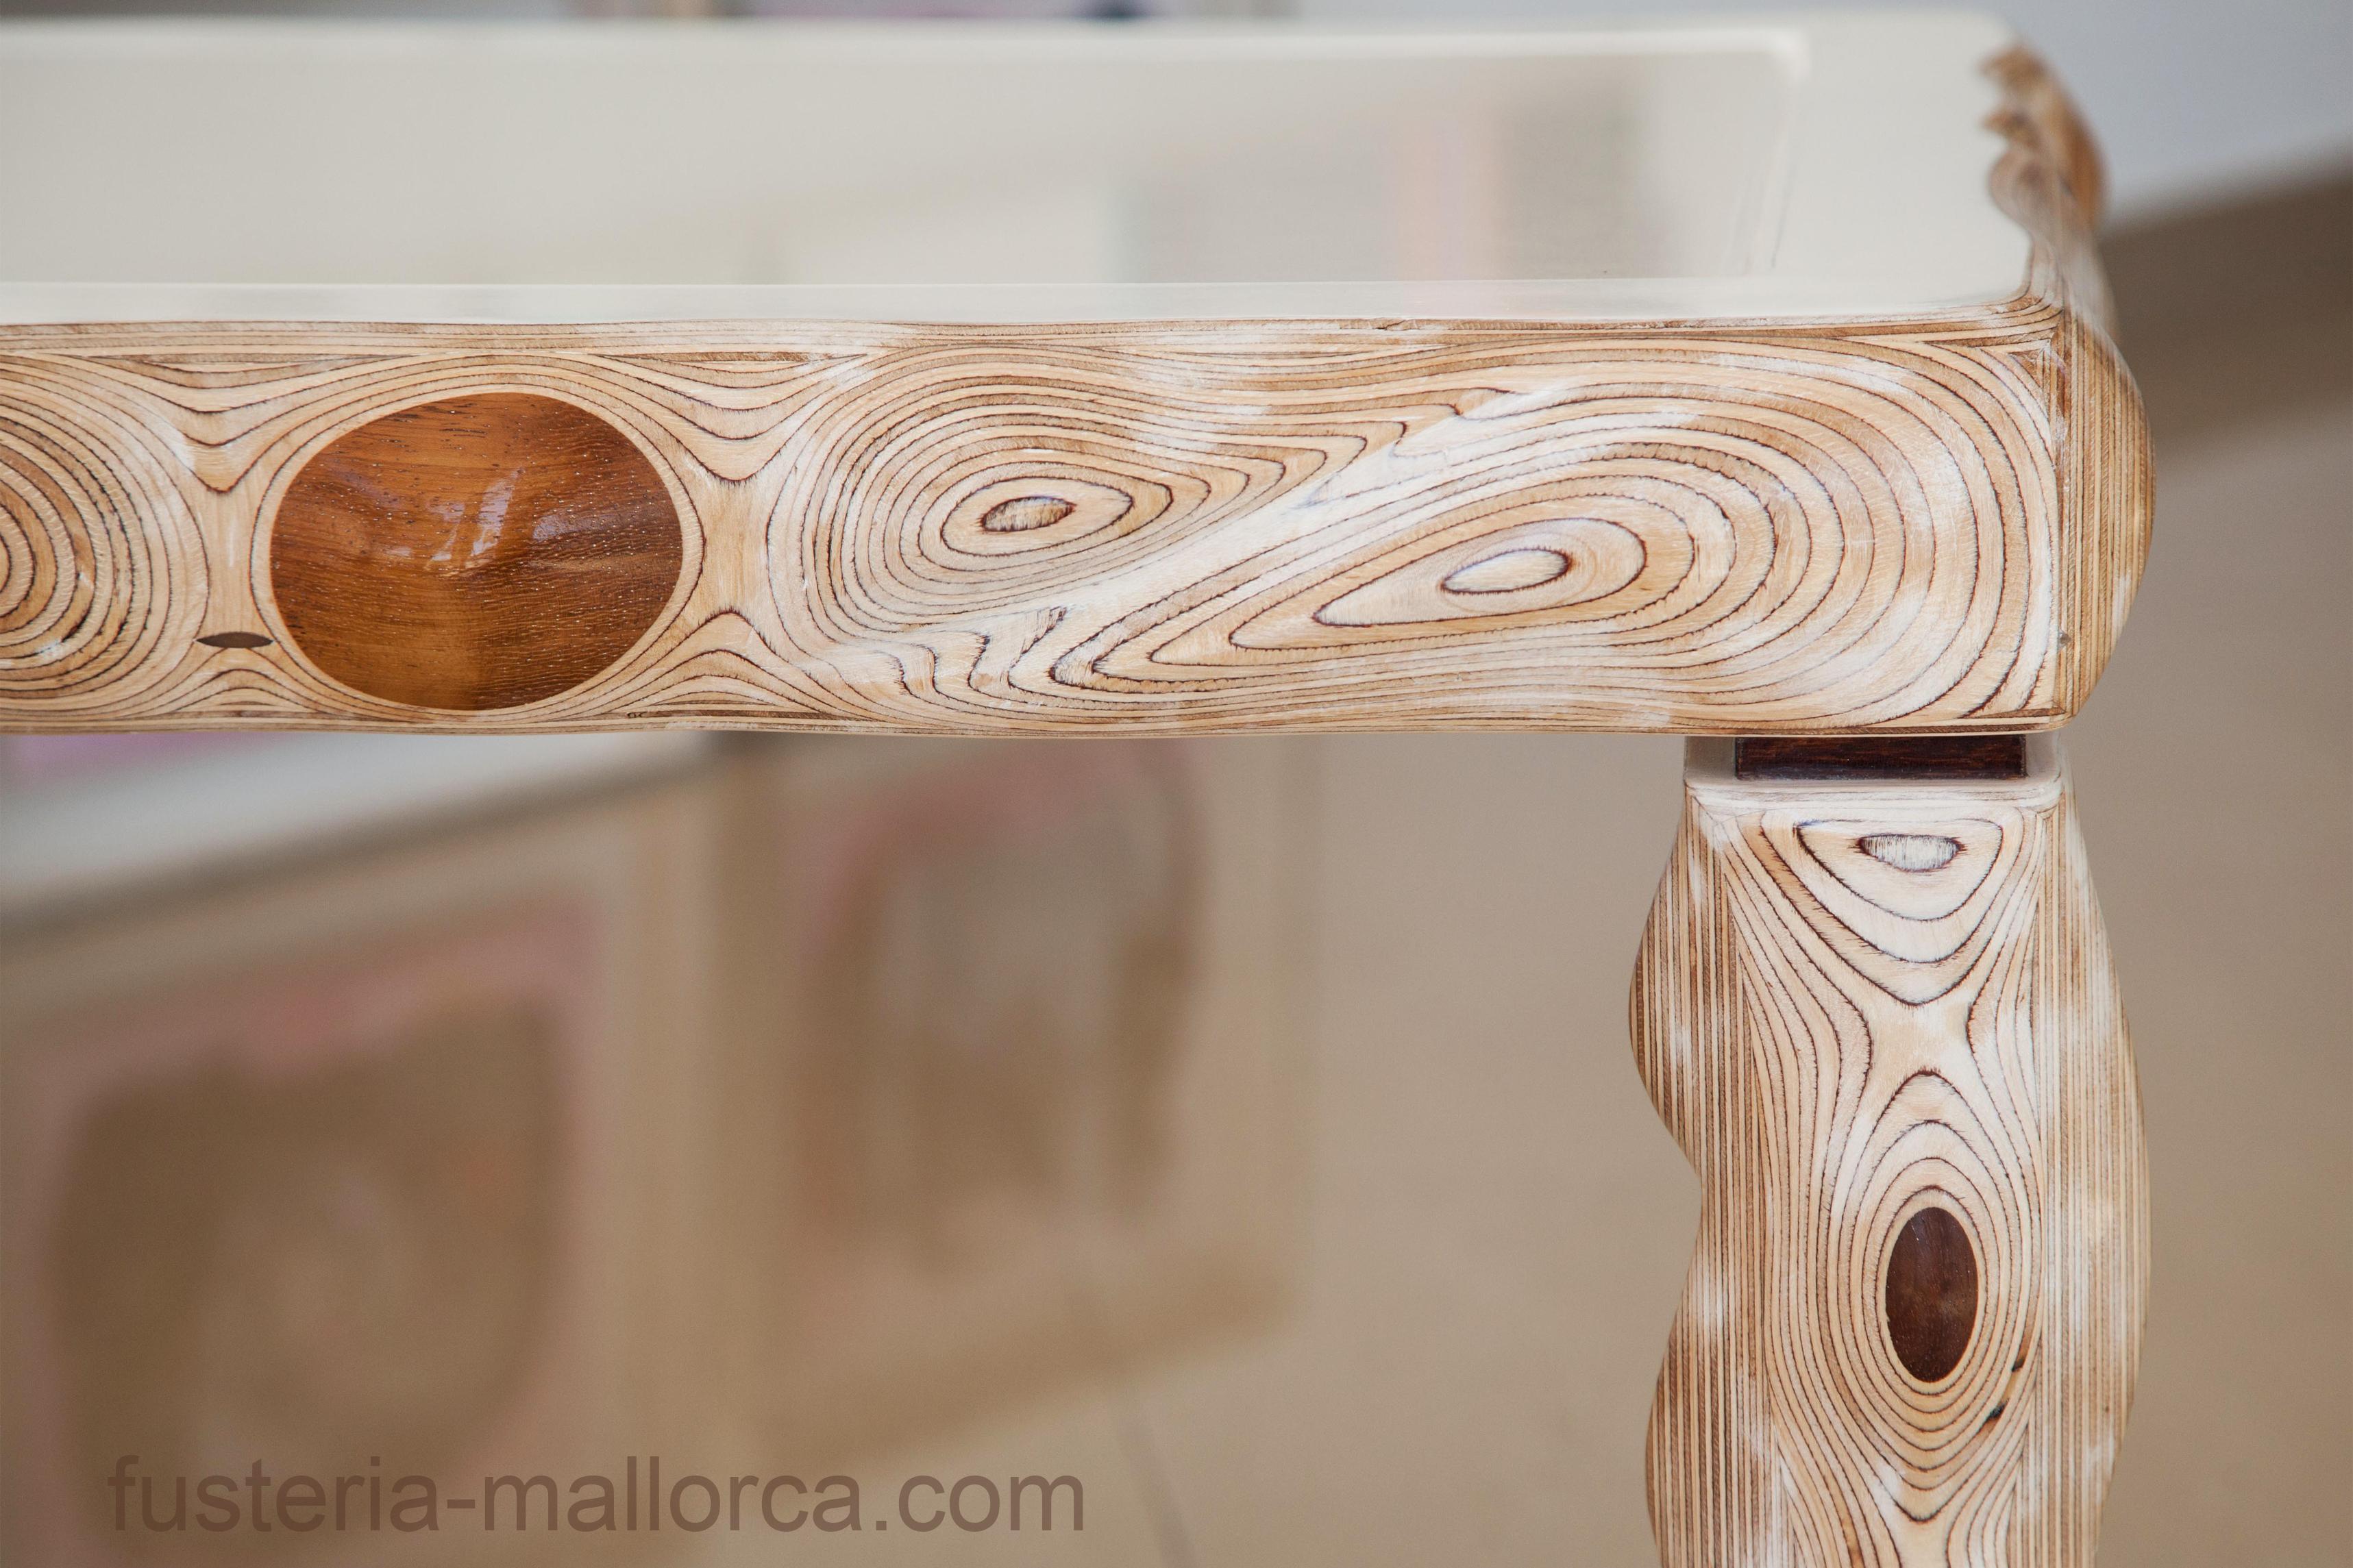 #wood #art #design #holz #kunst #design #madera #arte #table #used #stoneandwood #tisch #mesa